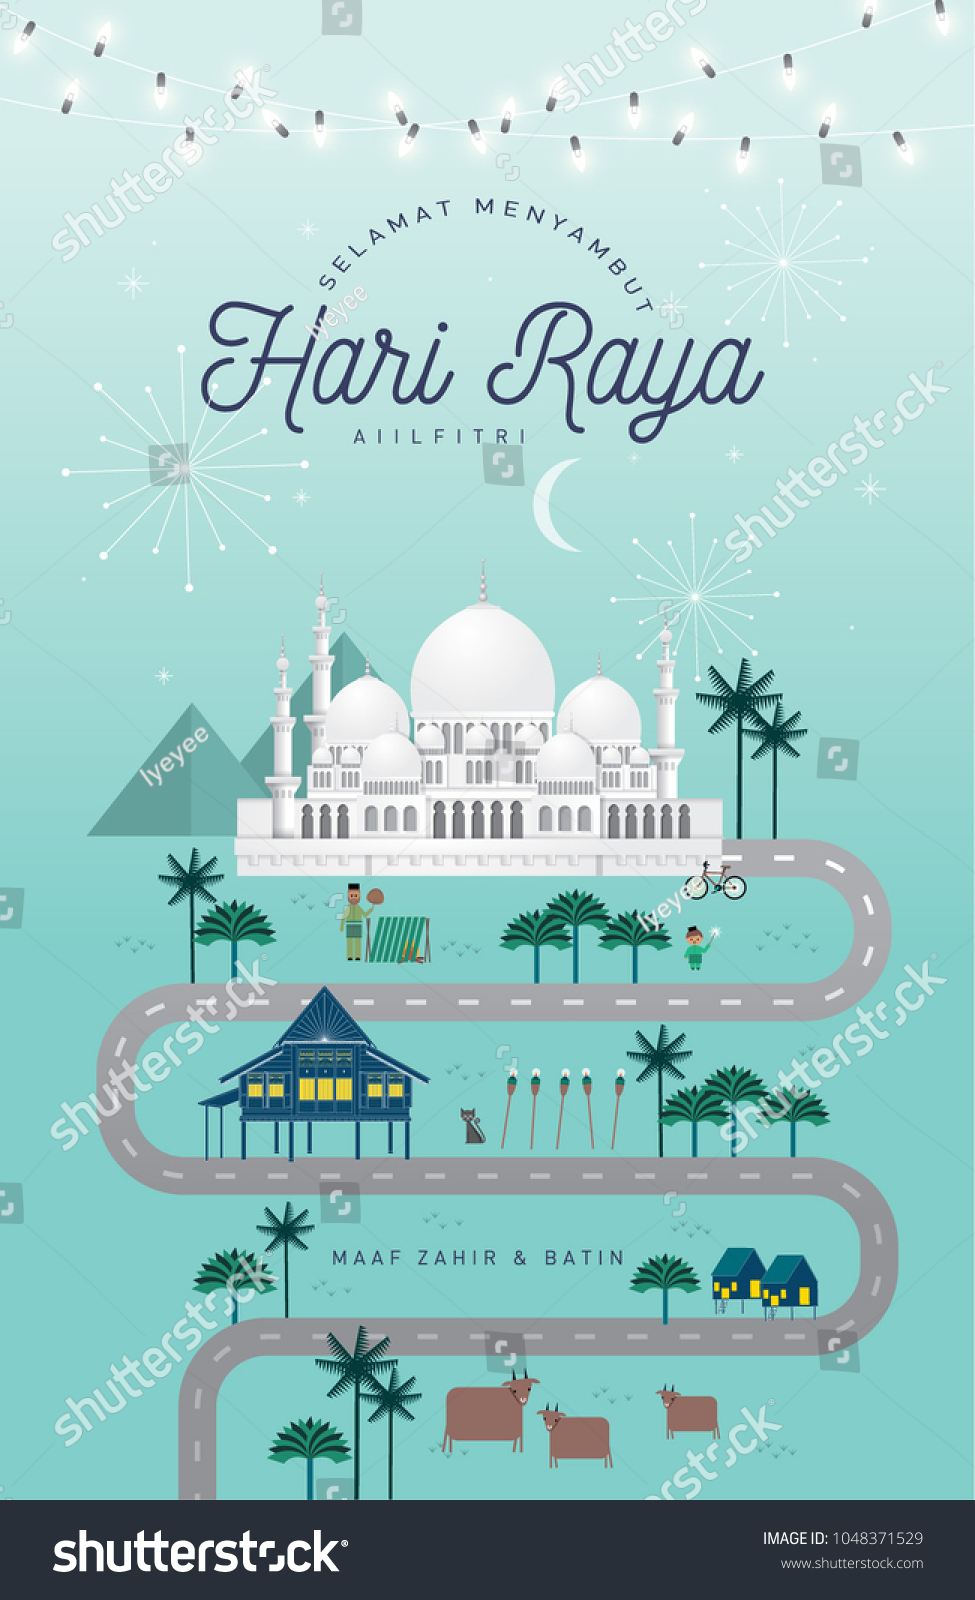 Hari Raya Journey Greetings Template Vectorillustration Stock Vector